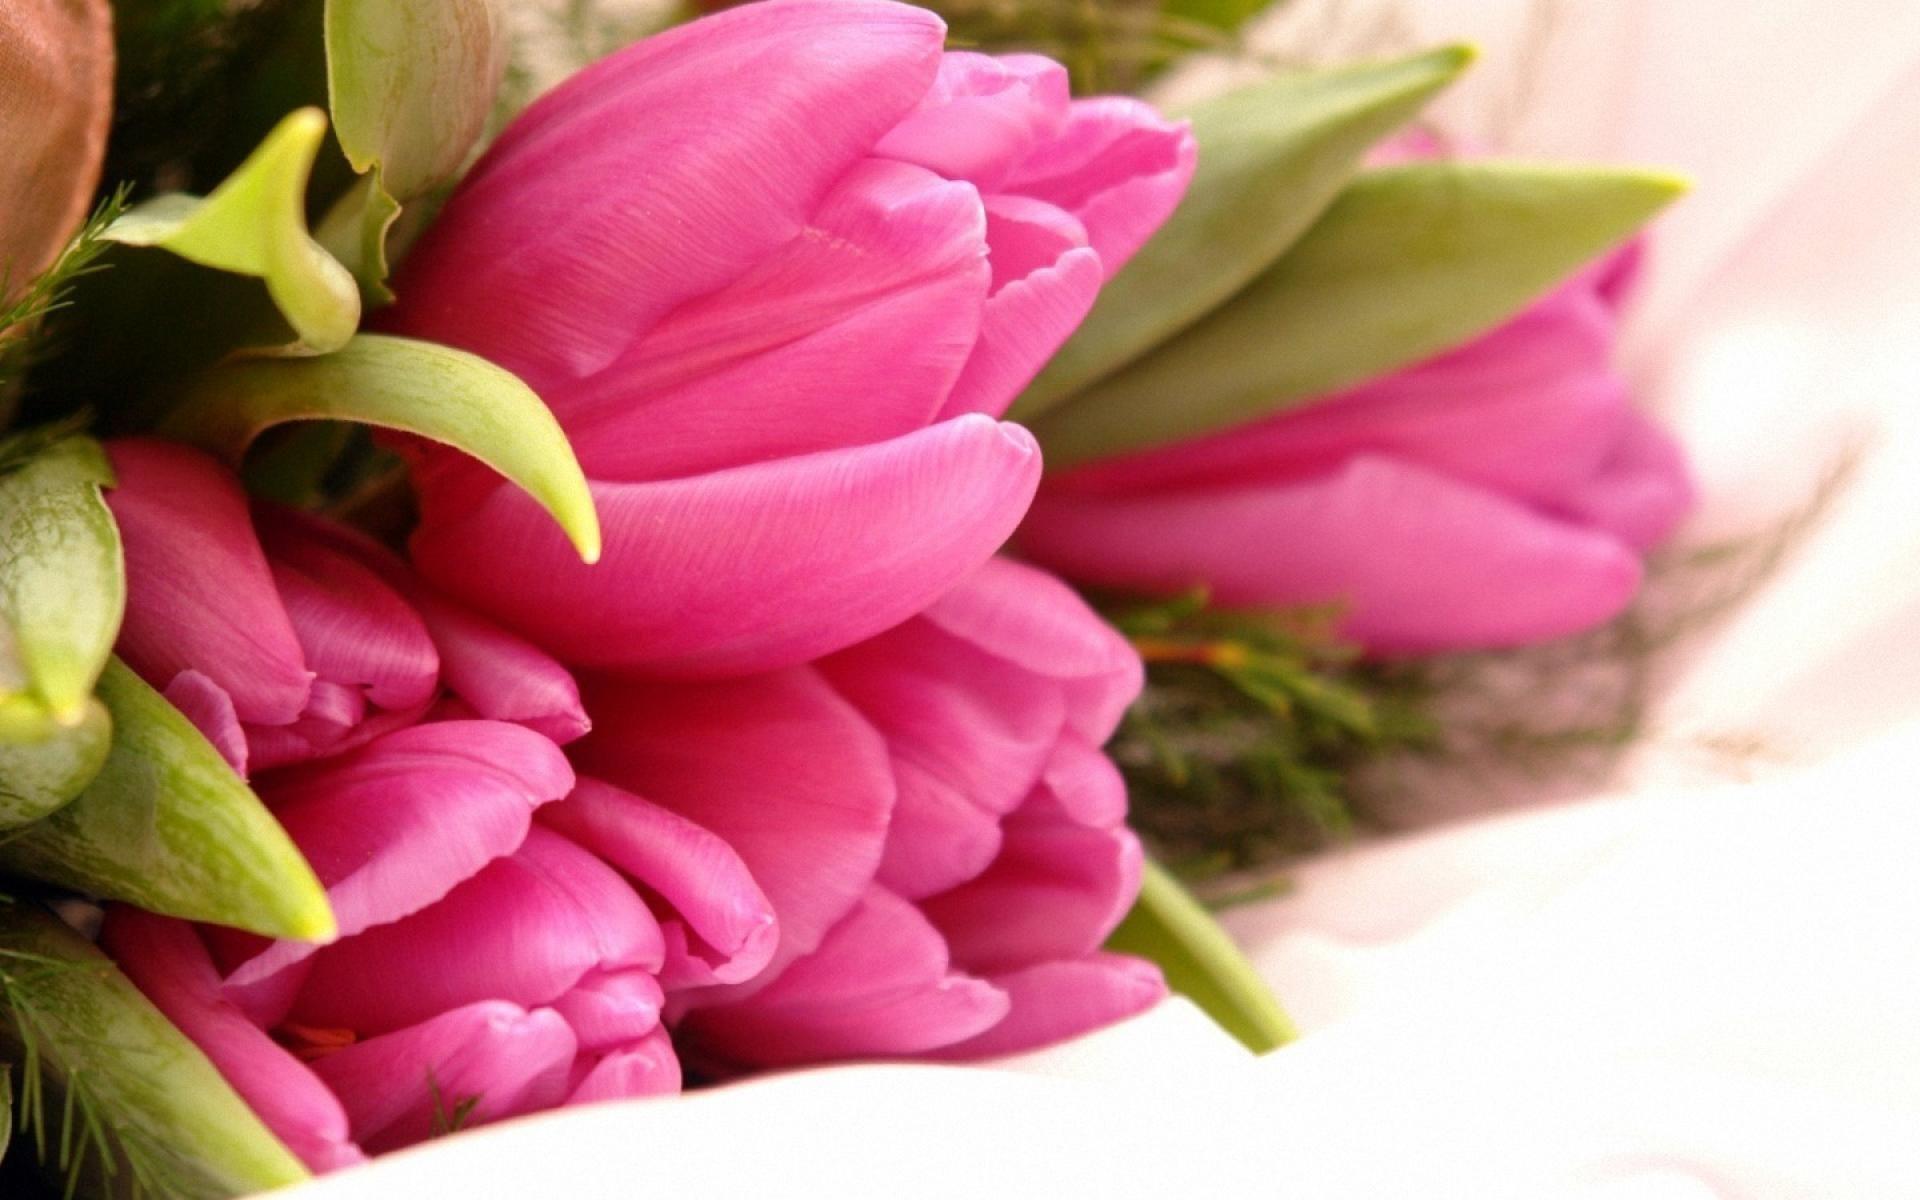 Tulip close up the dissected bouquet pinterest beautiful e261fbec73aeace1ae97b4826edf9618g izmirmasajfo Choice Image